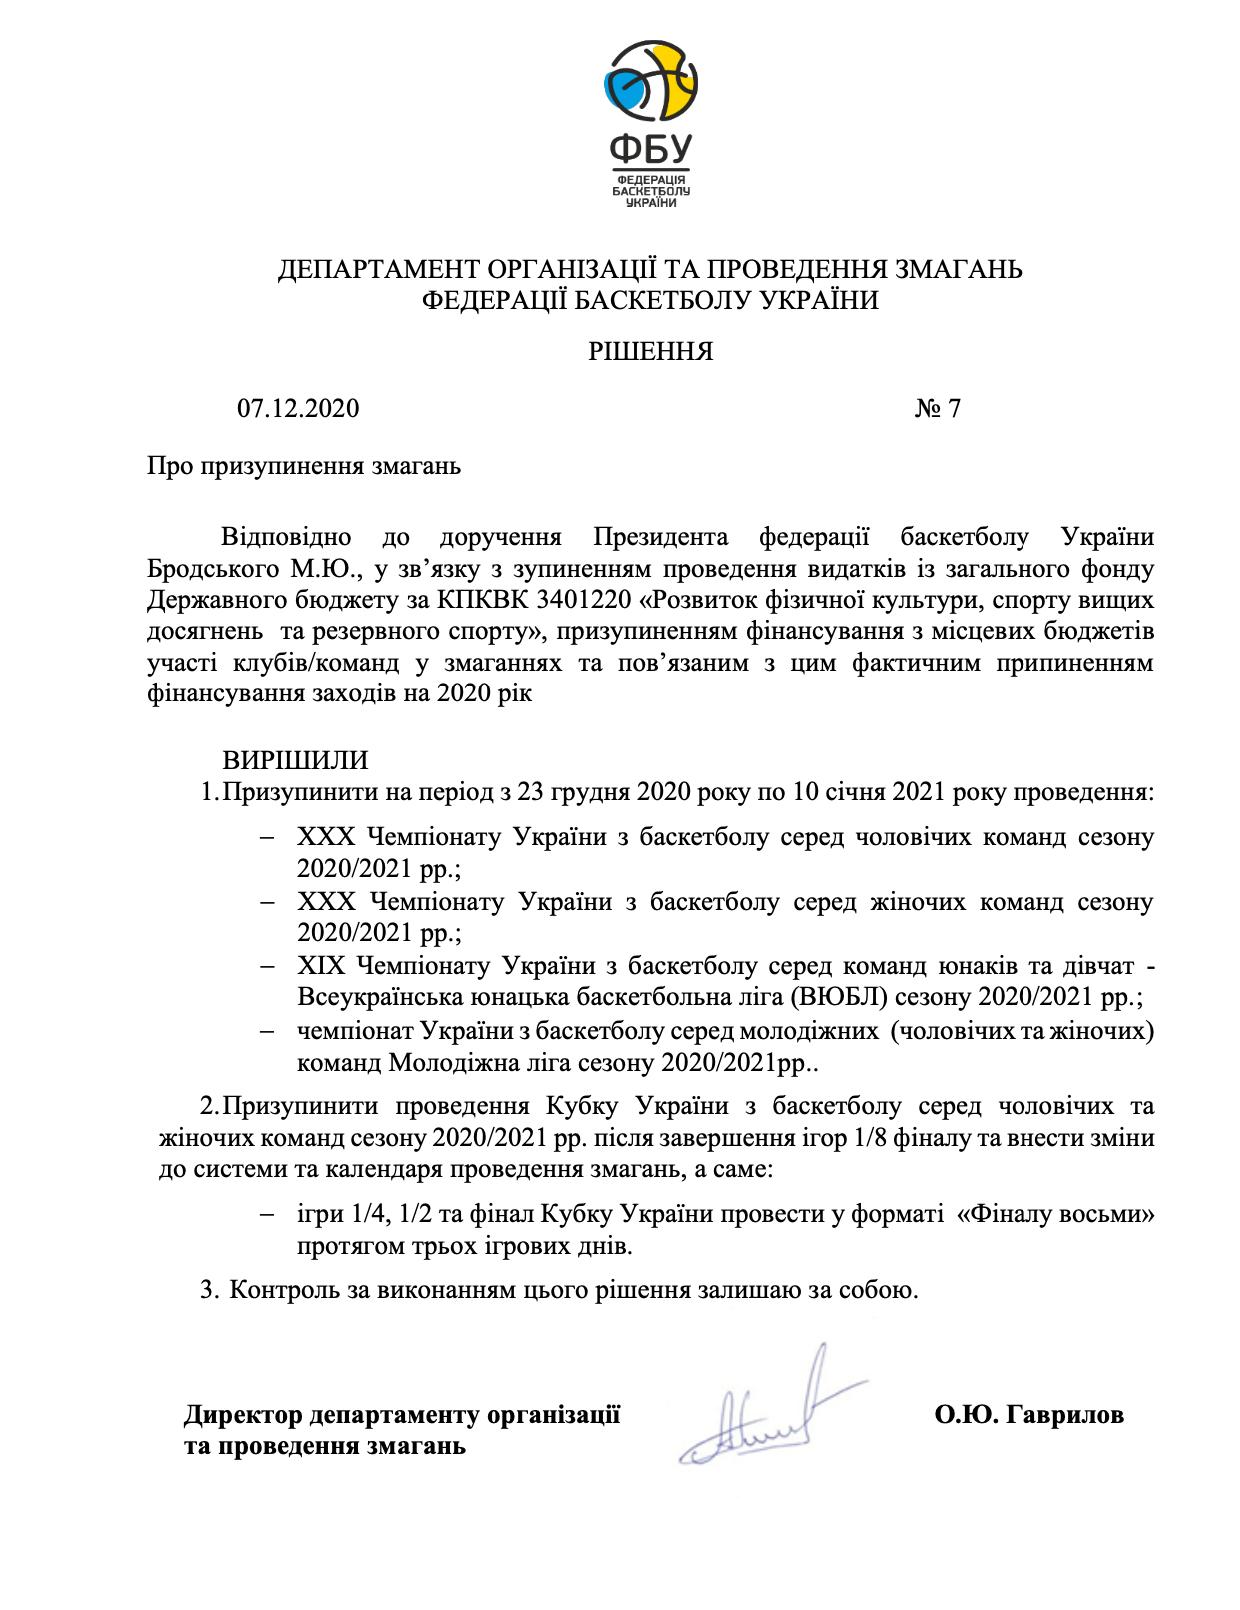 ФБУ приостановит все чемпионаты Украины по баскетболу